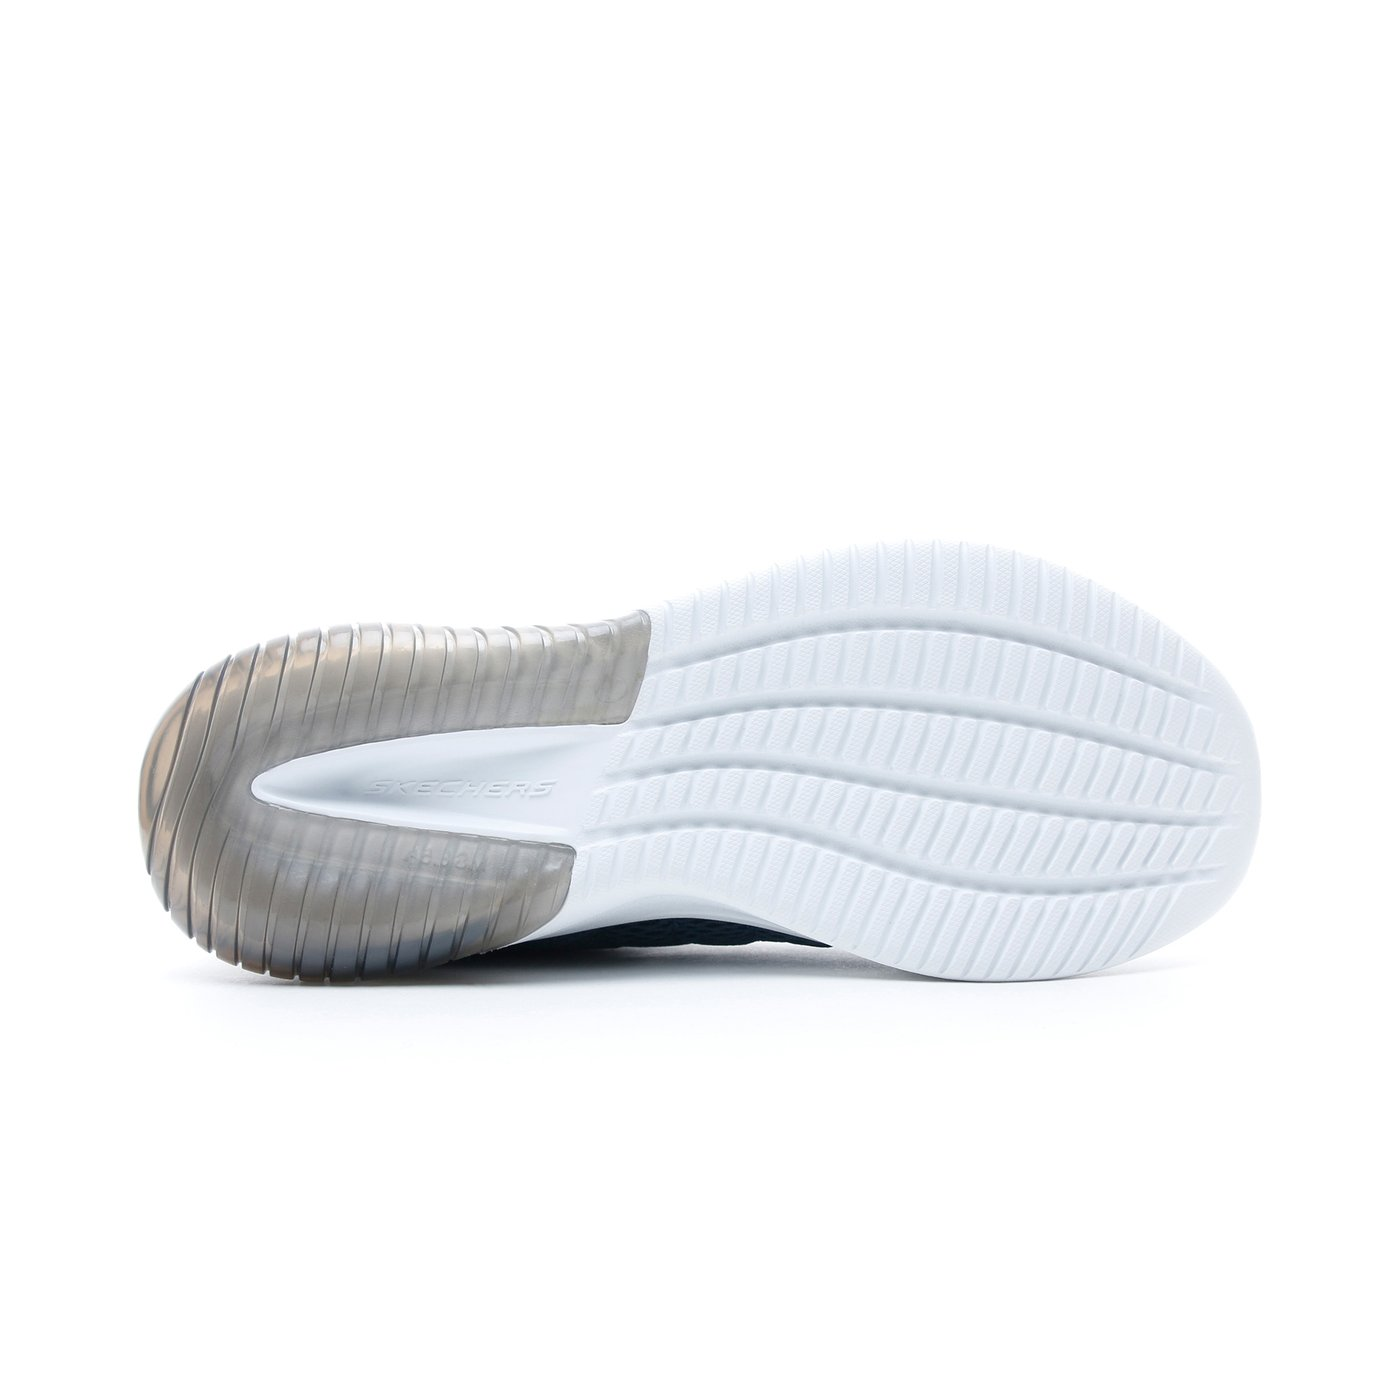 Skechers Skech-Air Ultra Flex Lacivert Erkek Spor Ayakkabı